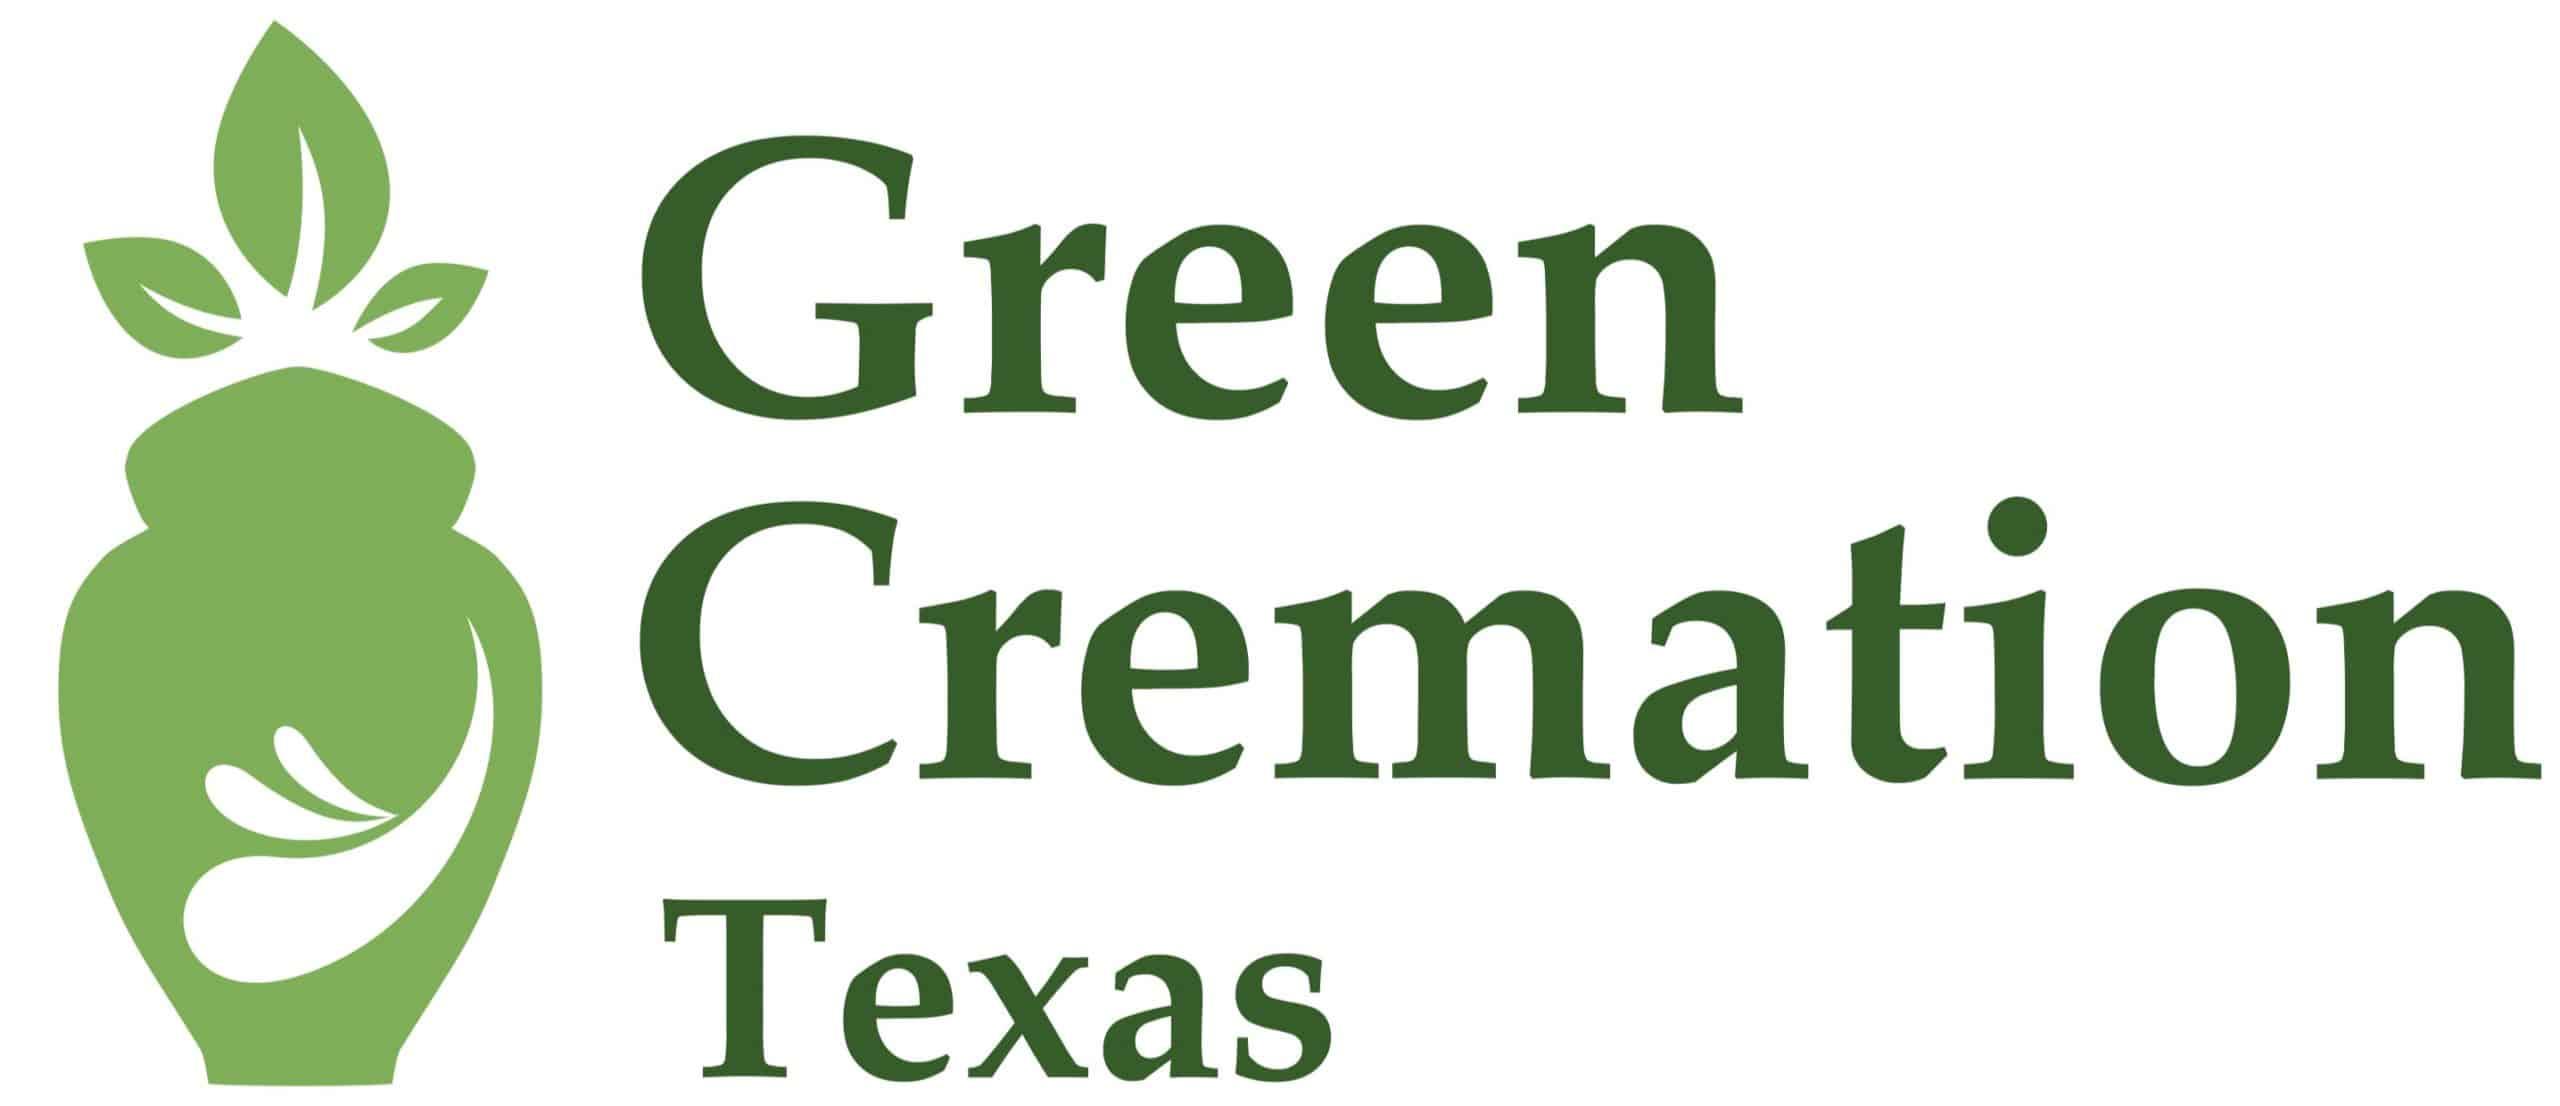 Green Cremation Texas